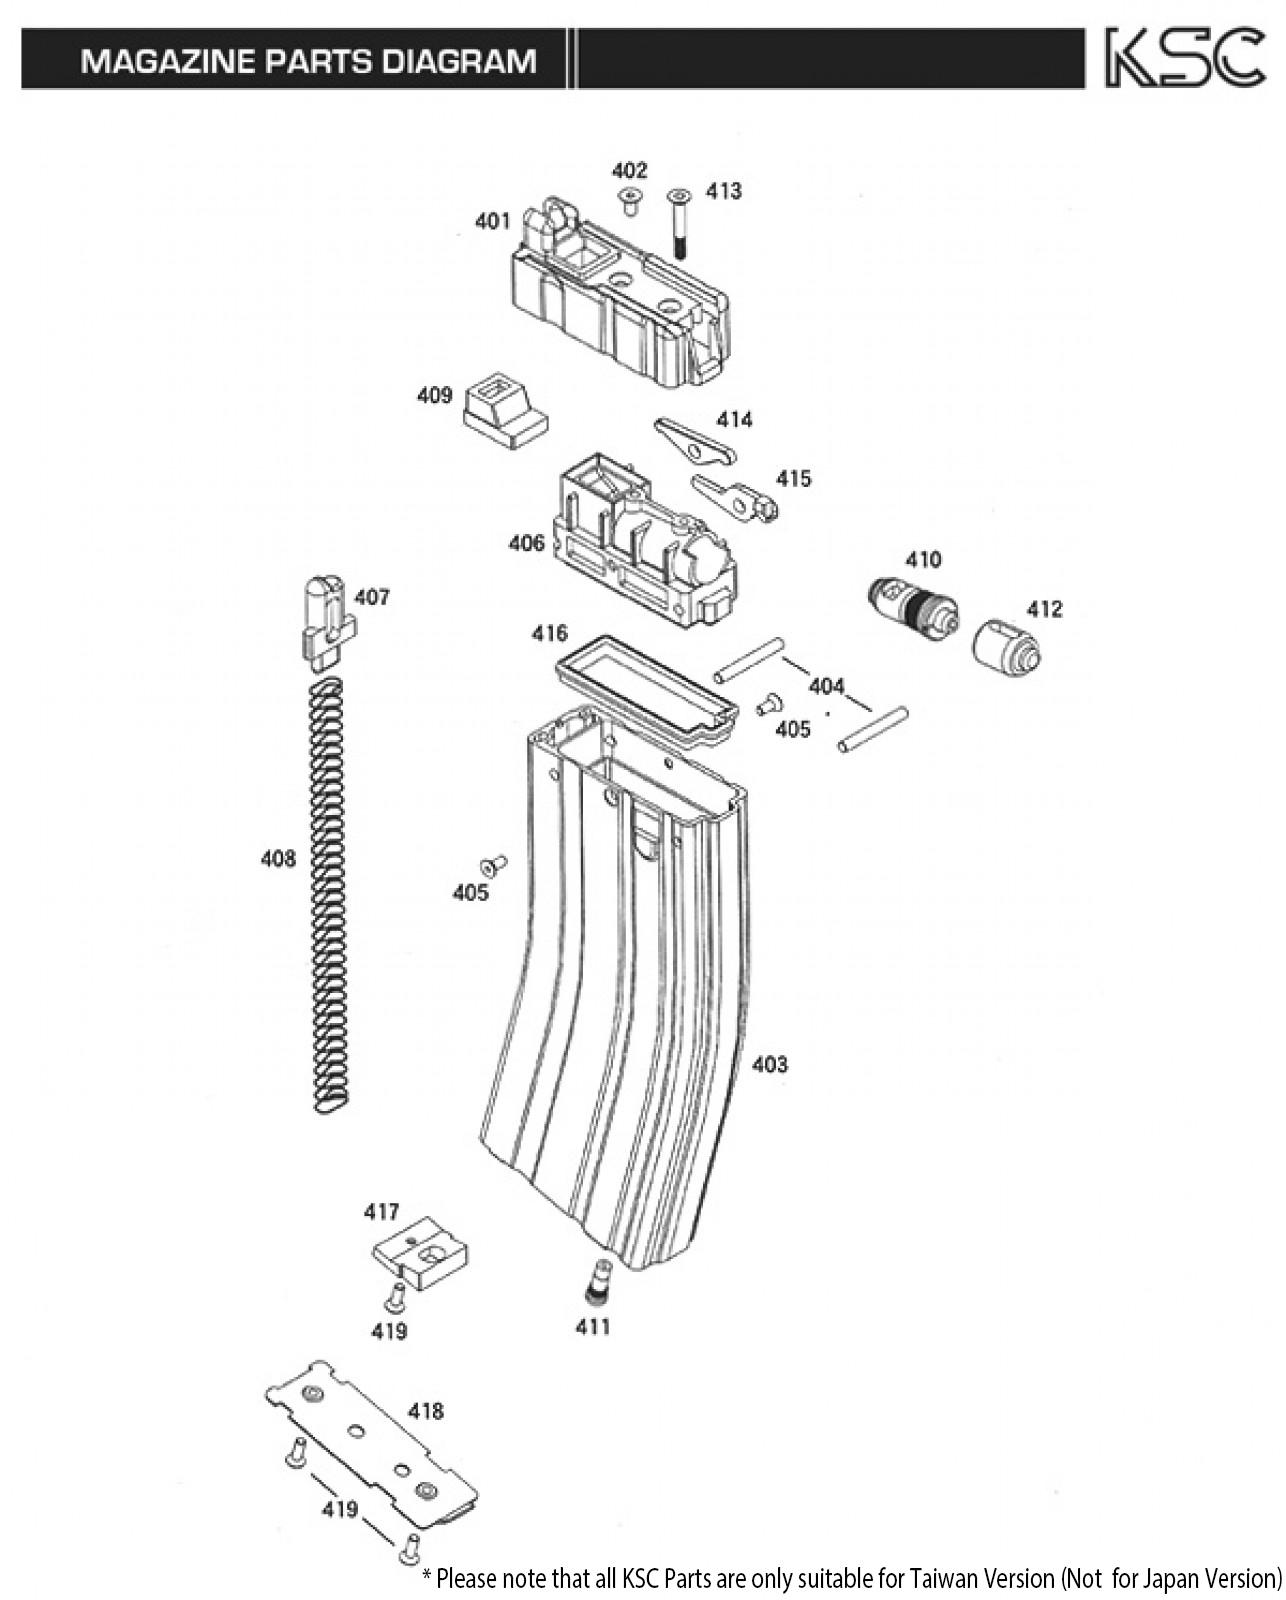 Exploded Diagram Ksc M4a1 Magazine  Ver 1   U2013 Ksc Part  U2013 Original  Worldwide Shipping